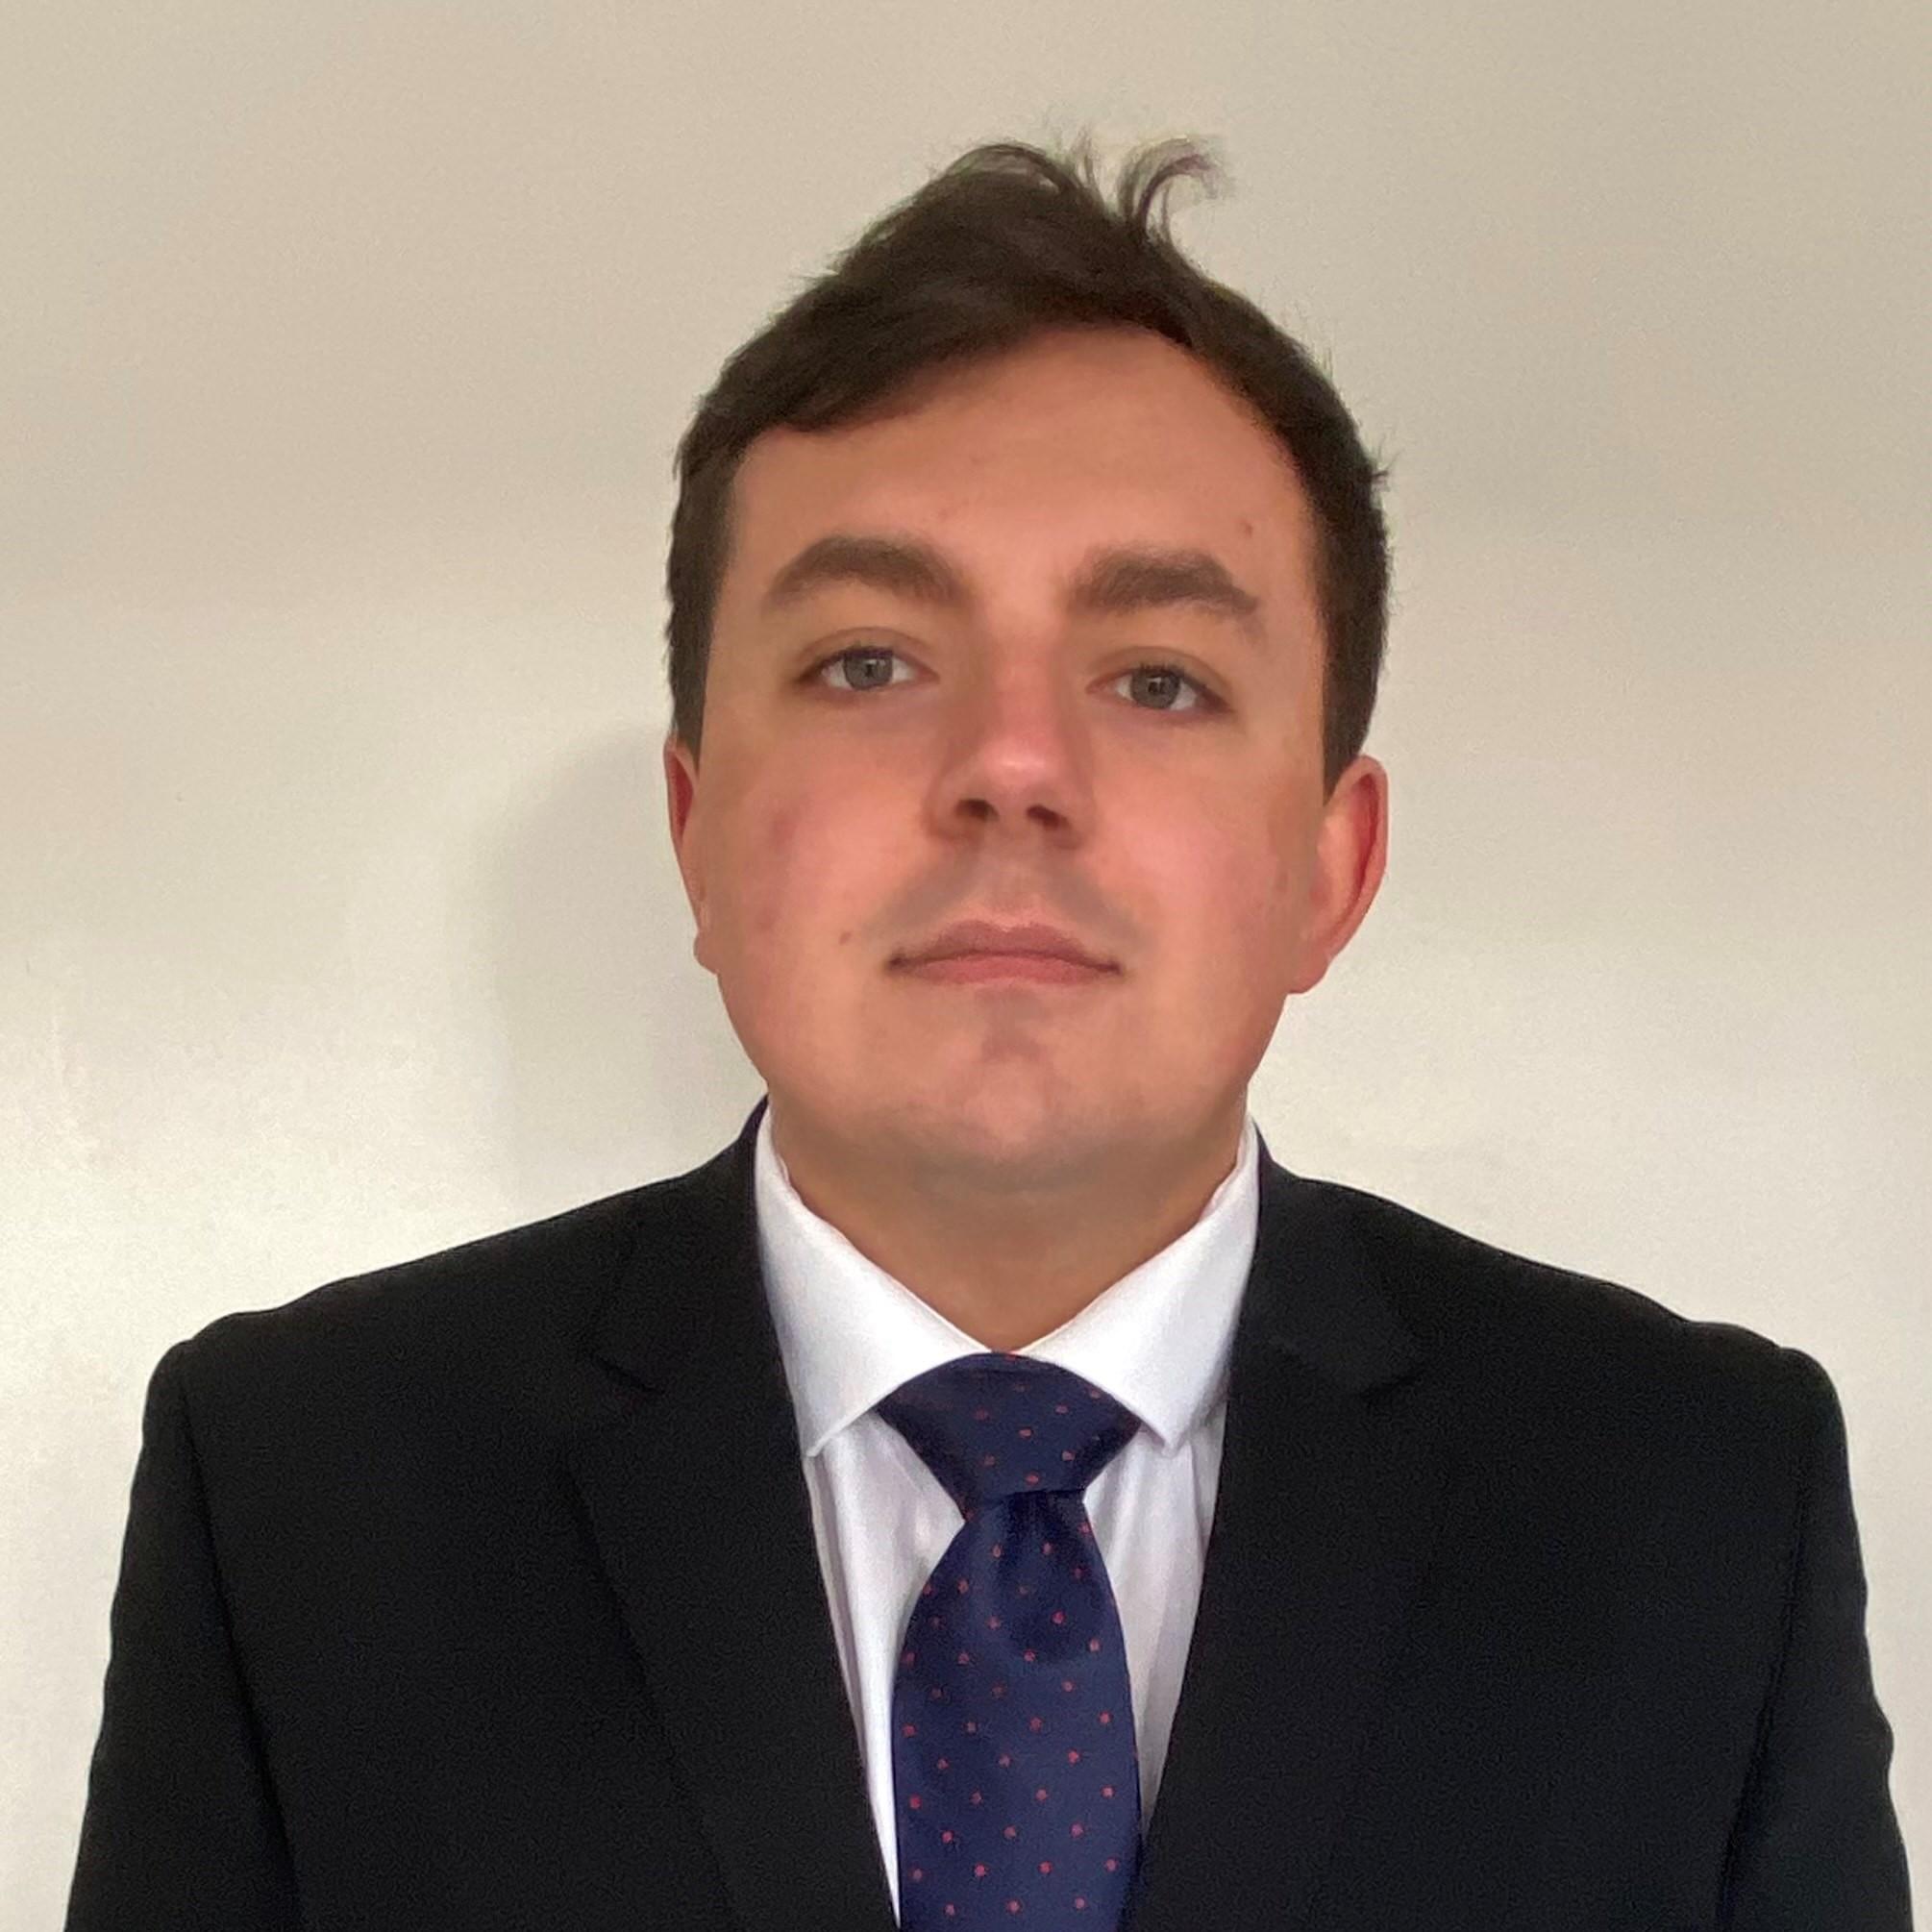 profile picture of blaise morris